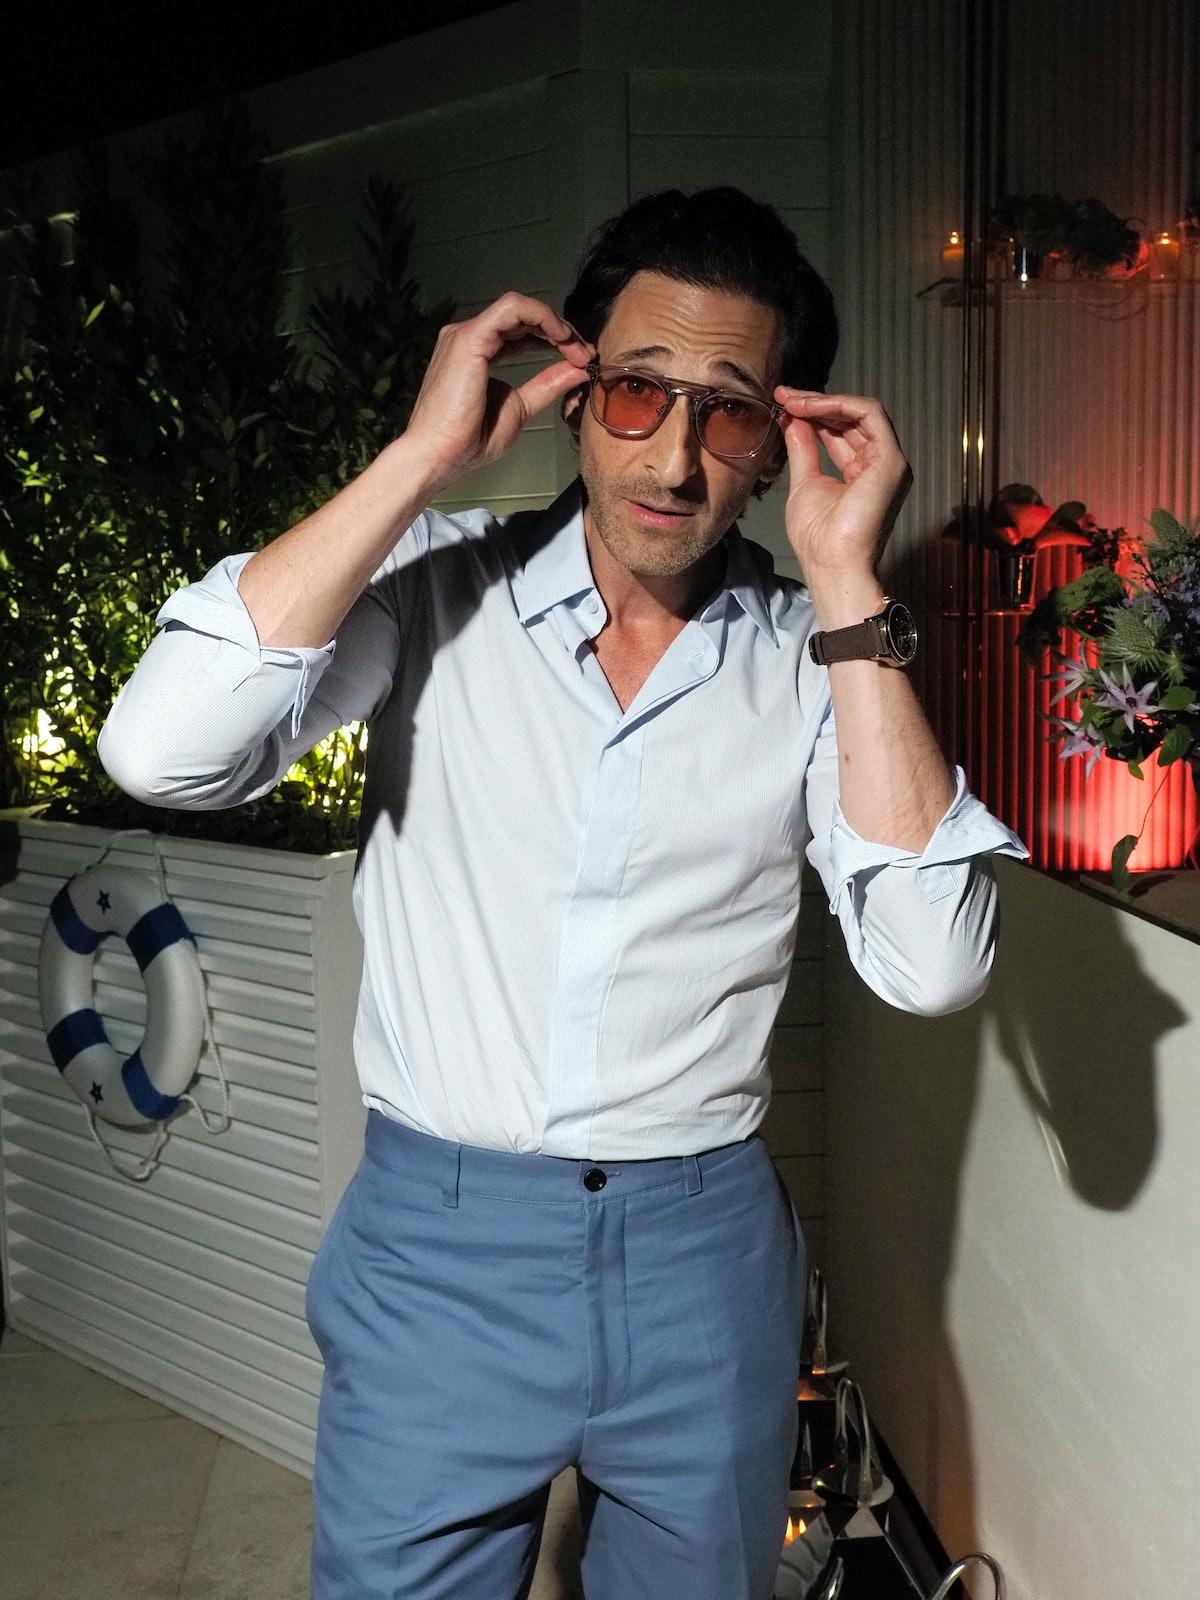 Adrien Brody touching his sunglasses